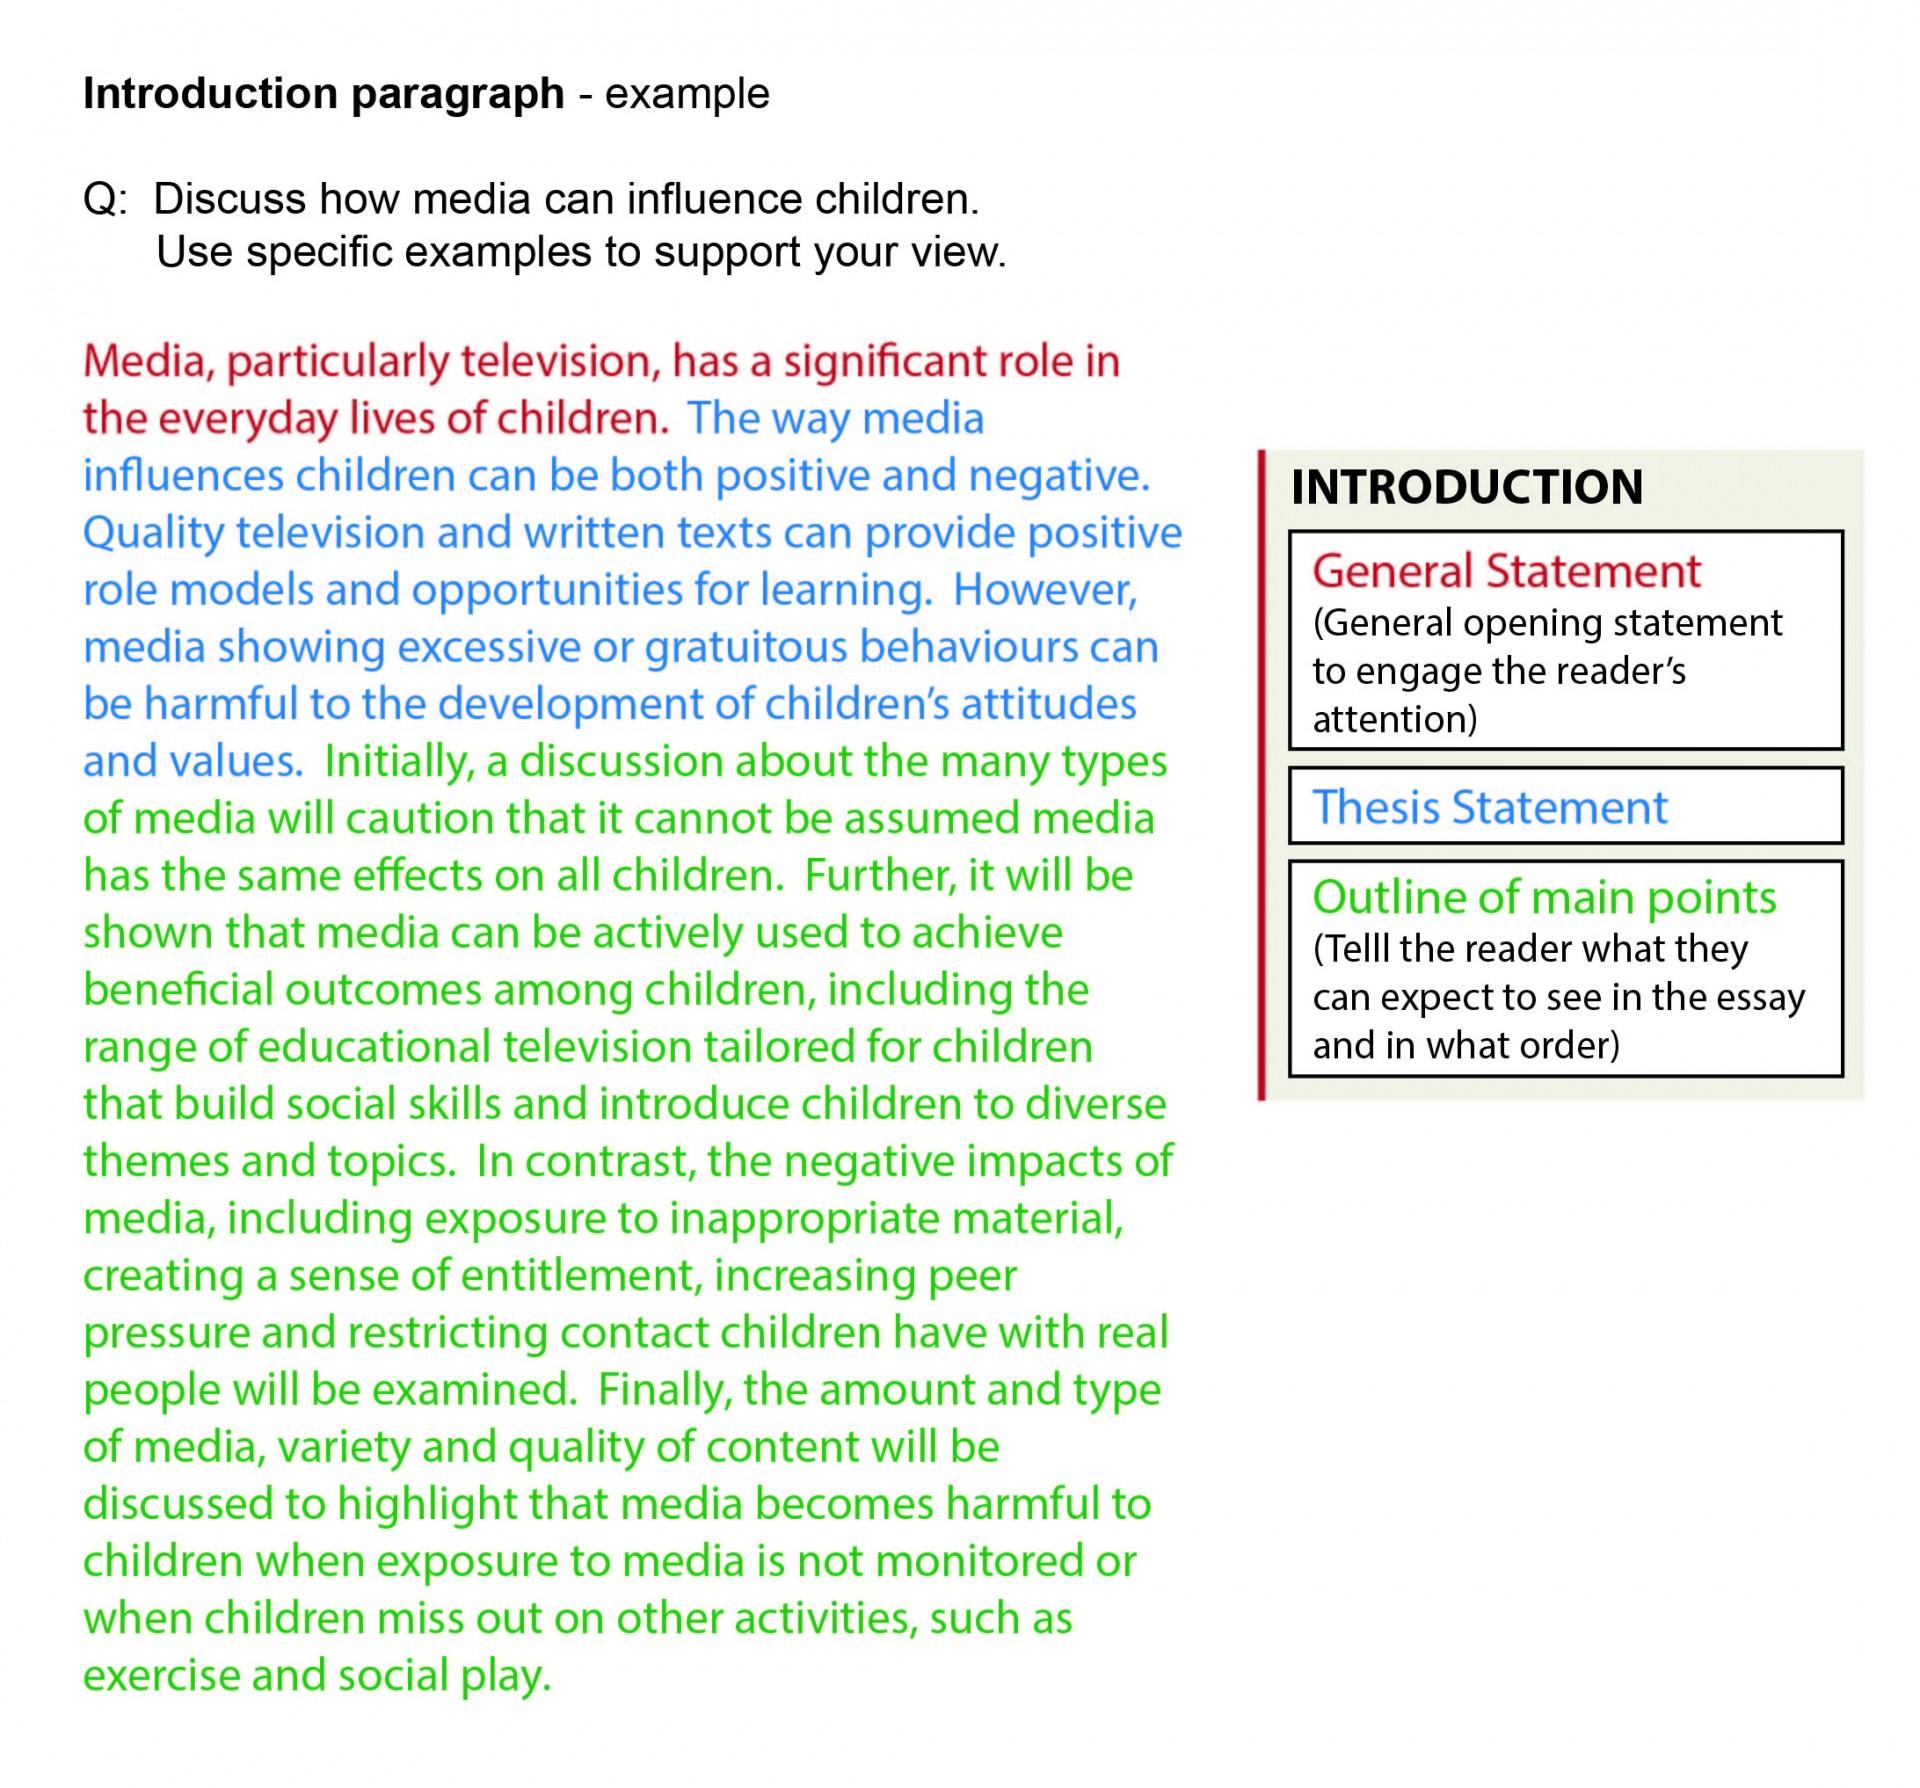 012 Introduction Essay Paragraph Stupendous Literary Example Argumentative Sample 1920